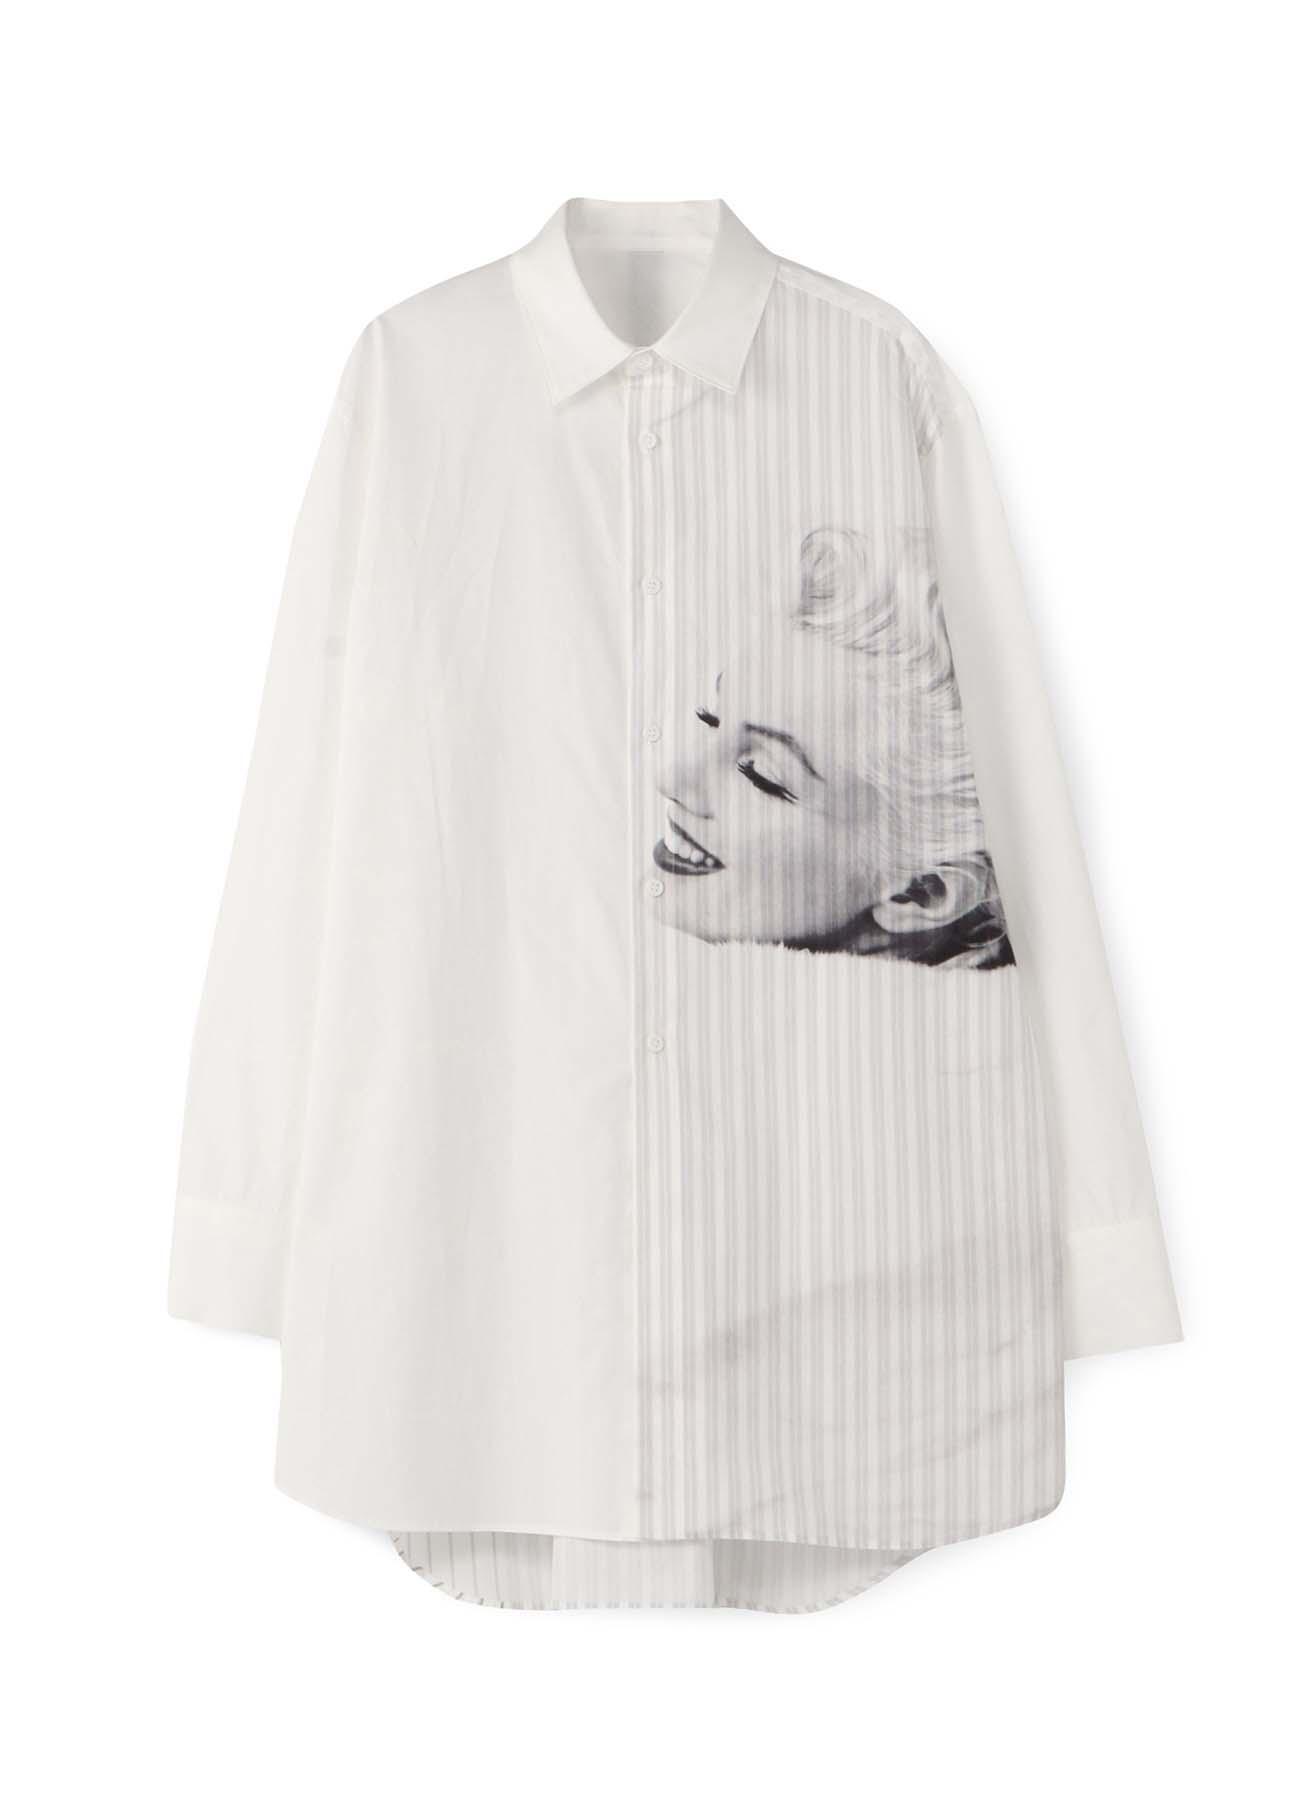 Marilyn Monroe Collaboration ストライプレギュラーシャツ